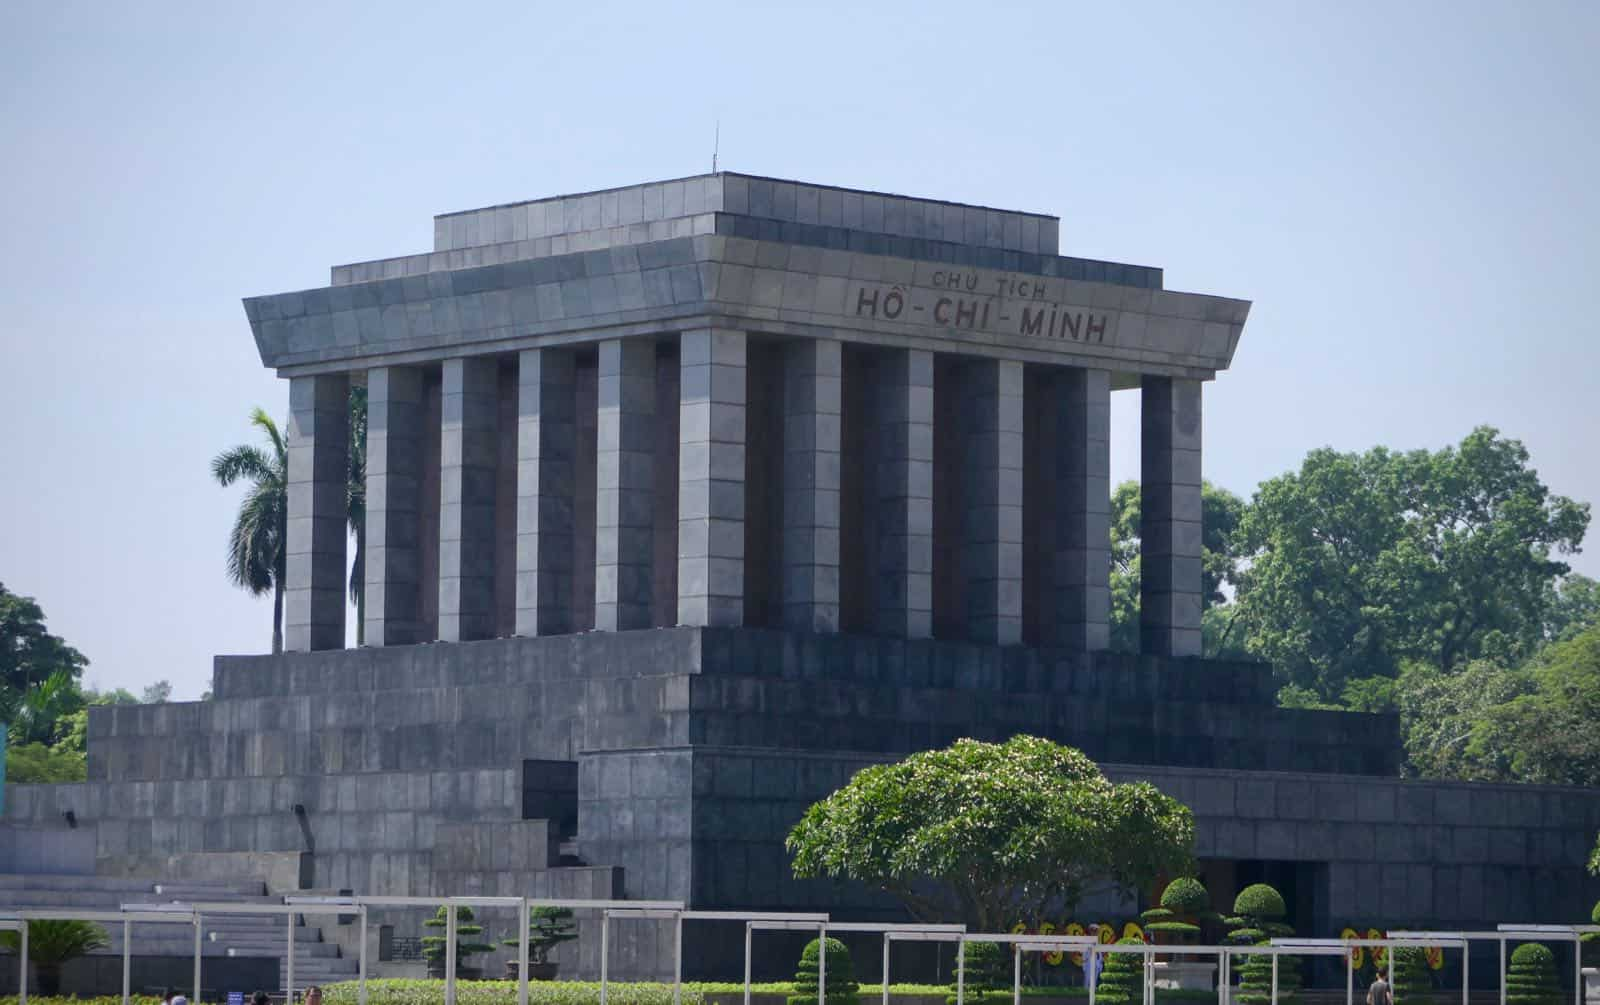 Ho Chi Minh Mauseleum Hanoi Vietnam betternotstop